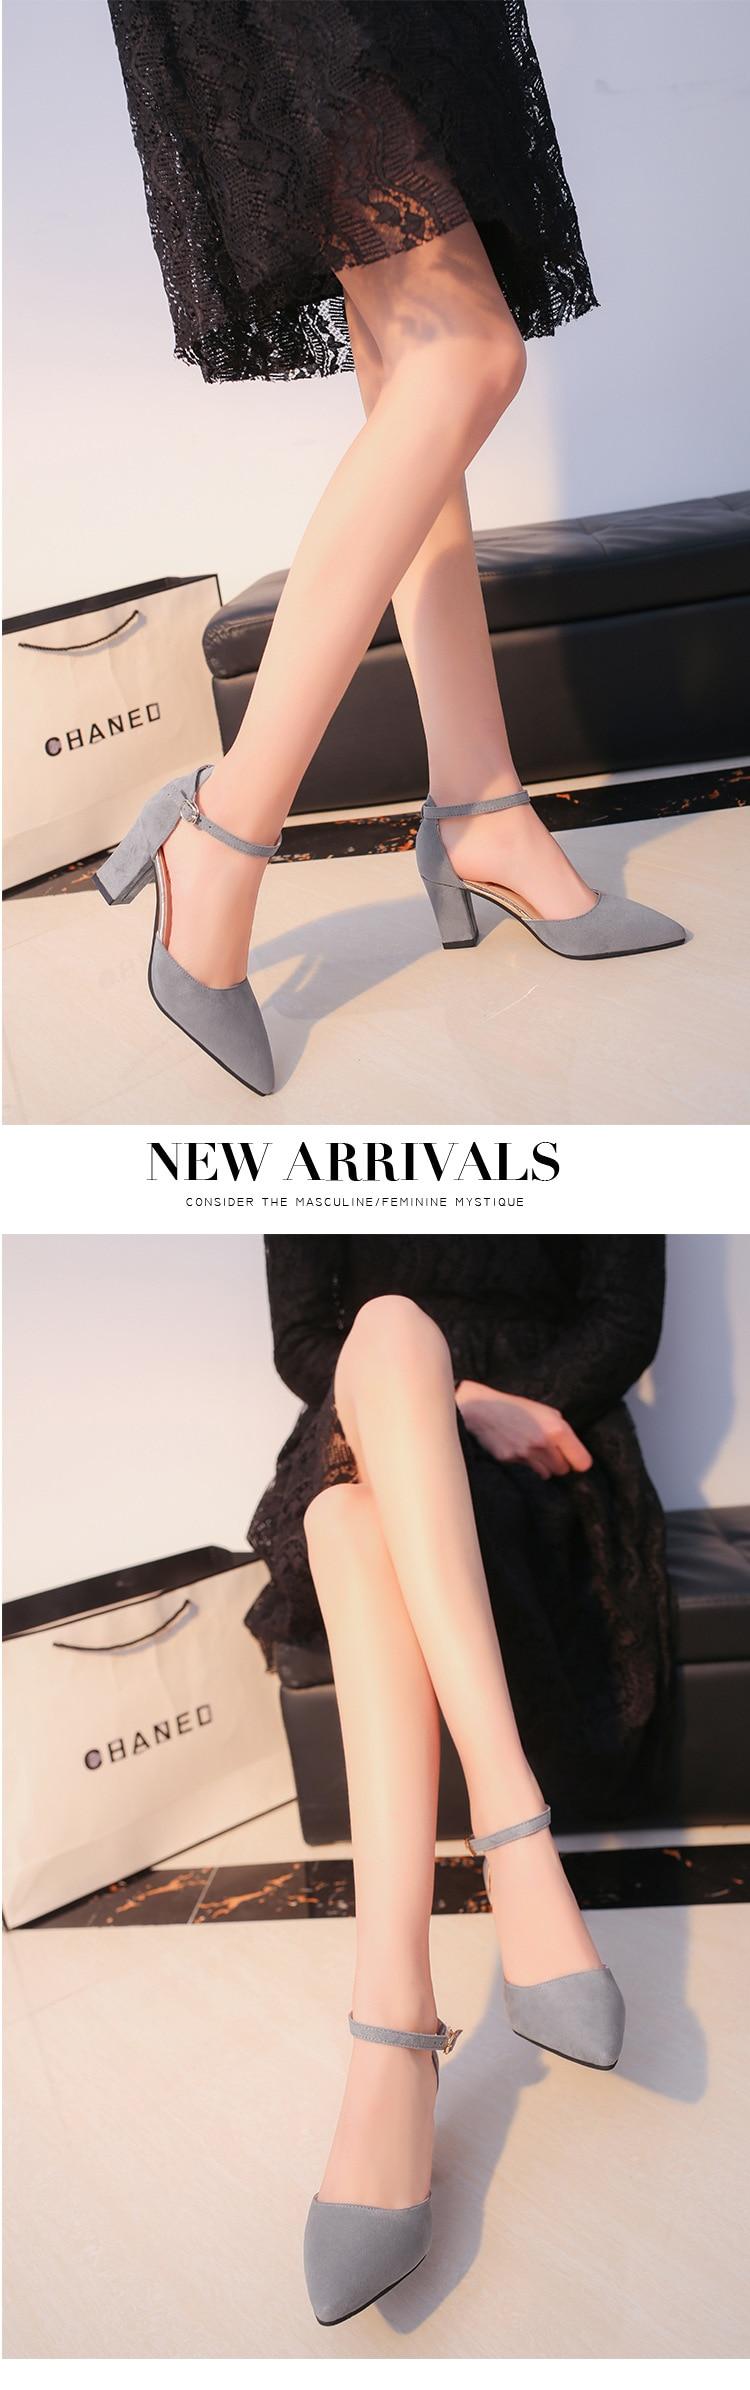 HTB1yB8Caf5TBuNjSspmq6yDRVXaM 2019 Fashion High Heels Newest Women Pumps Summer Women Shoes Thick Heel Pumps Comfortable Shoes Woman Platform Shoes s0013